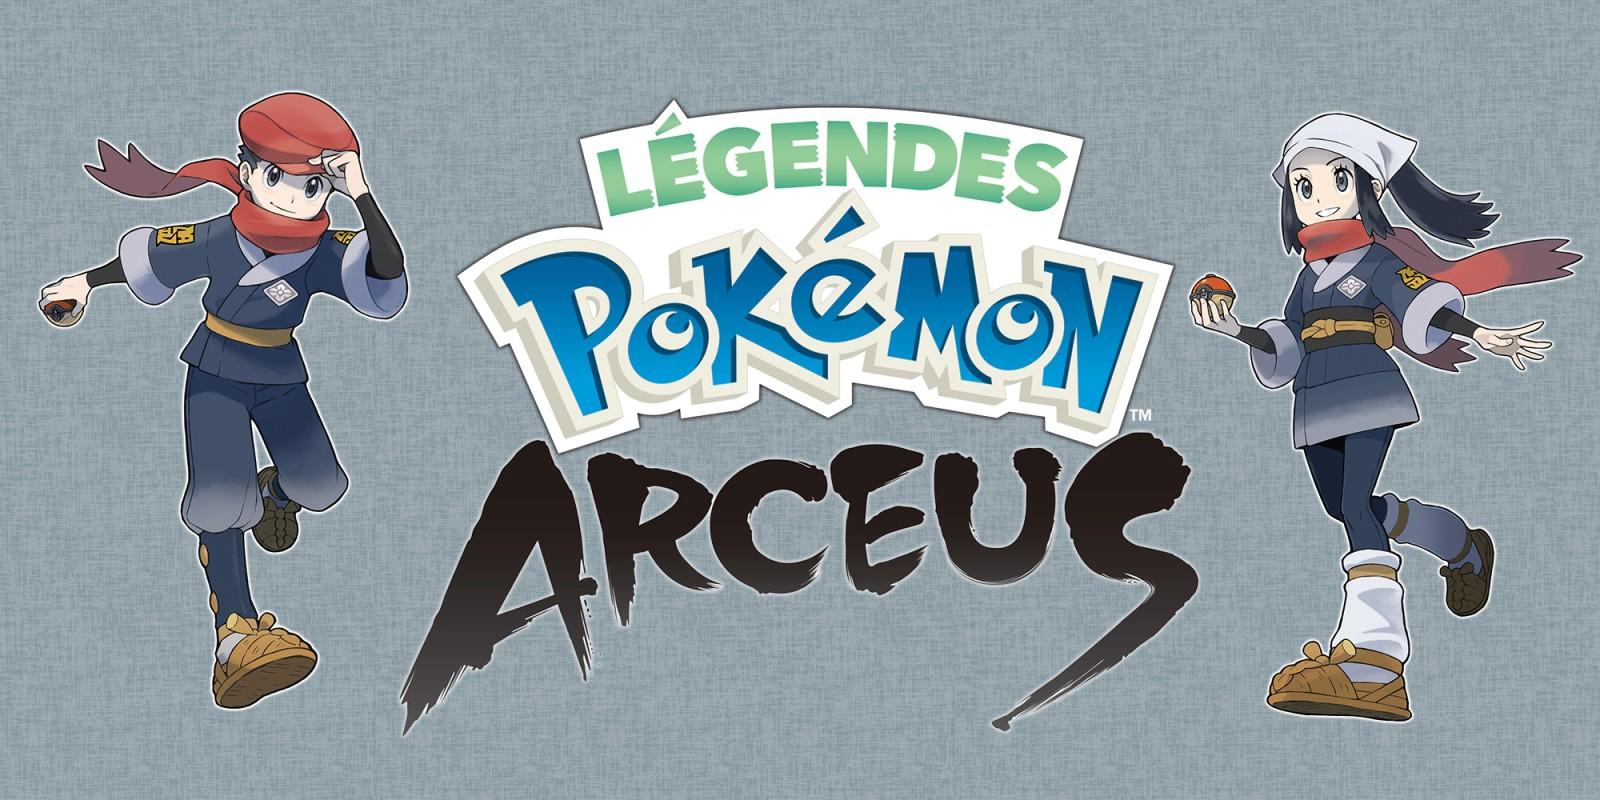 H2x1_NSwitch_PokemonLegendsArceus_frFR_image1600w